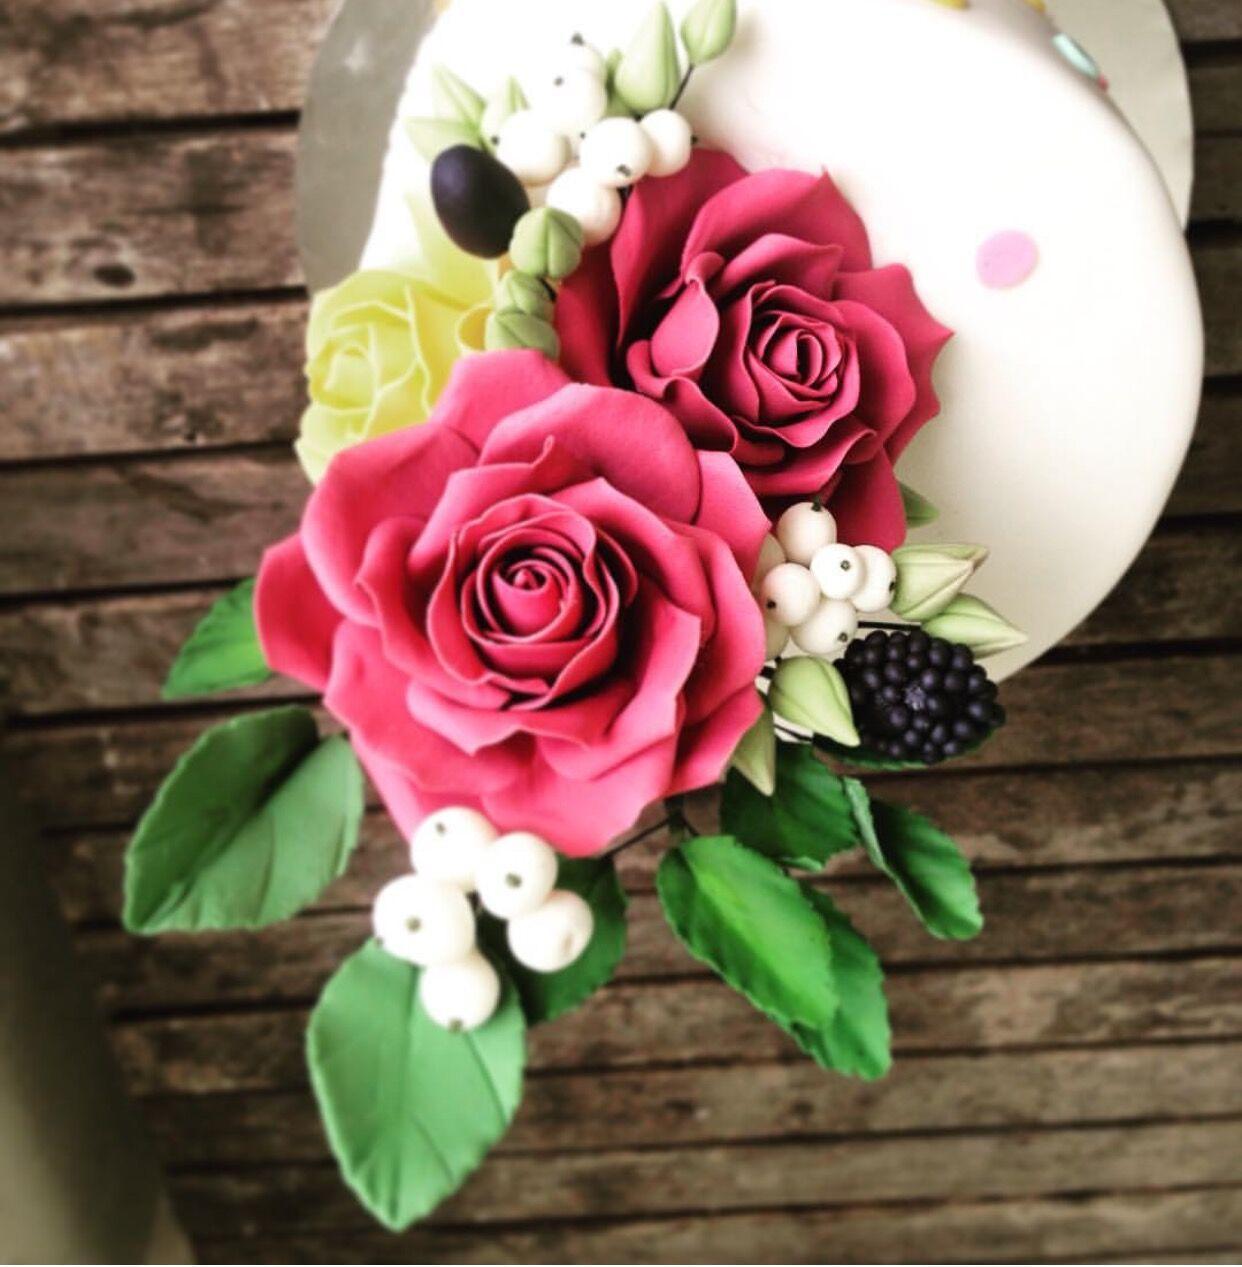 Bright pink sugar roses